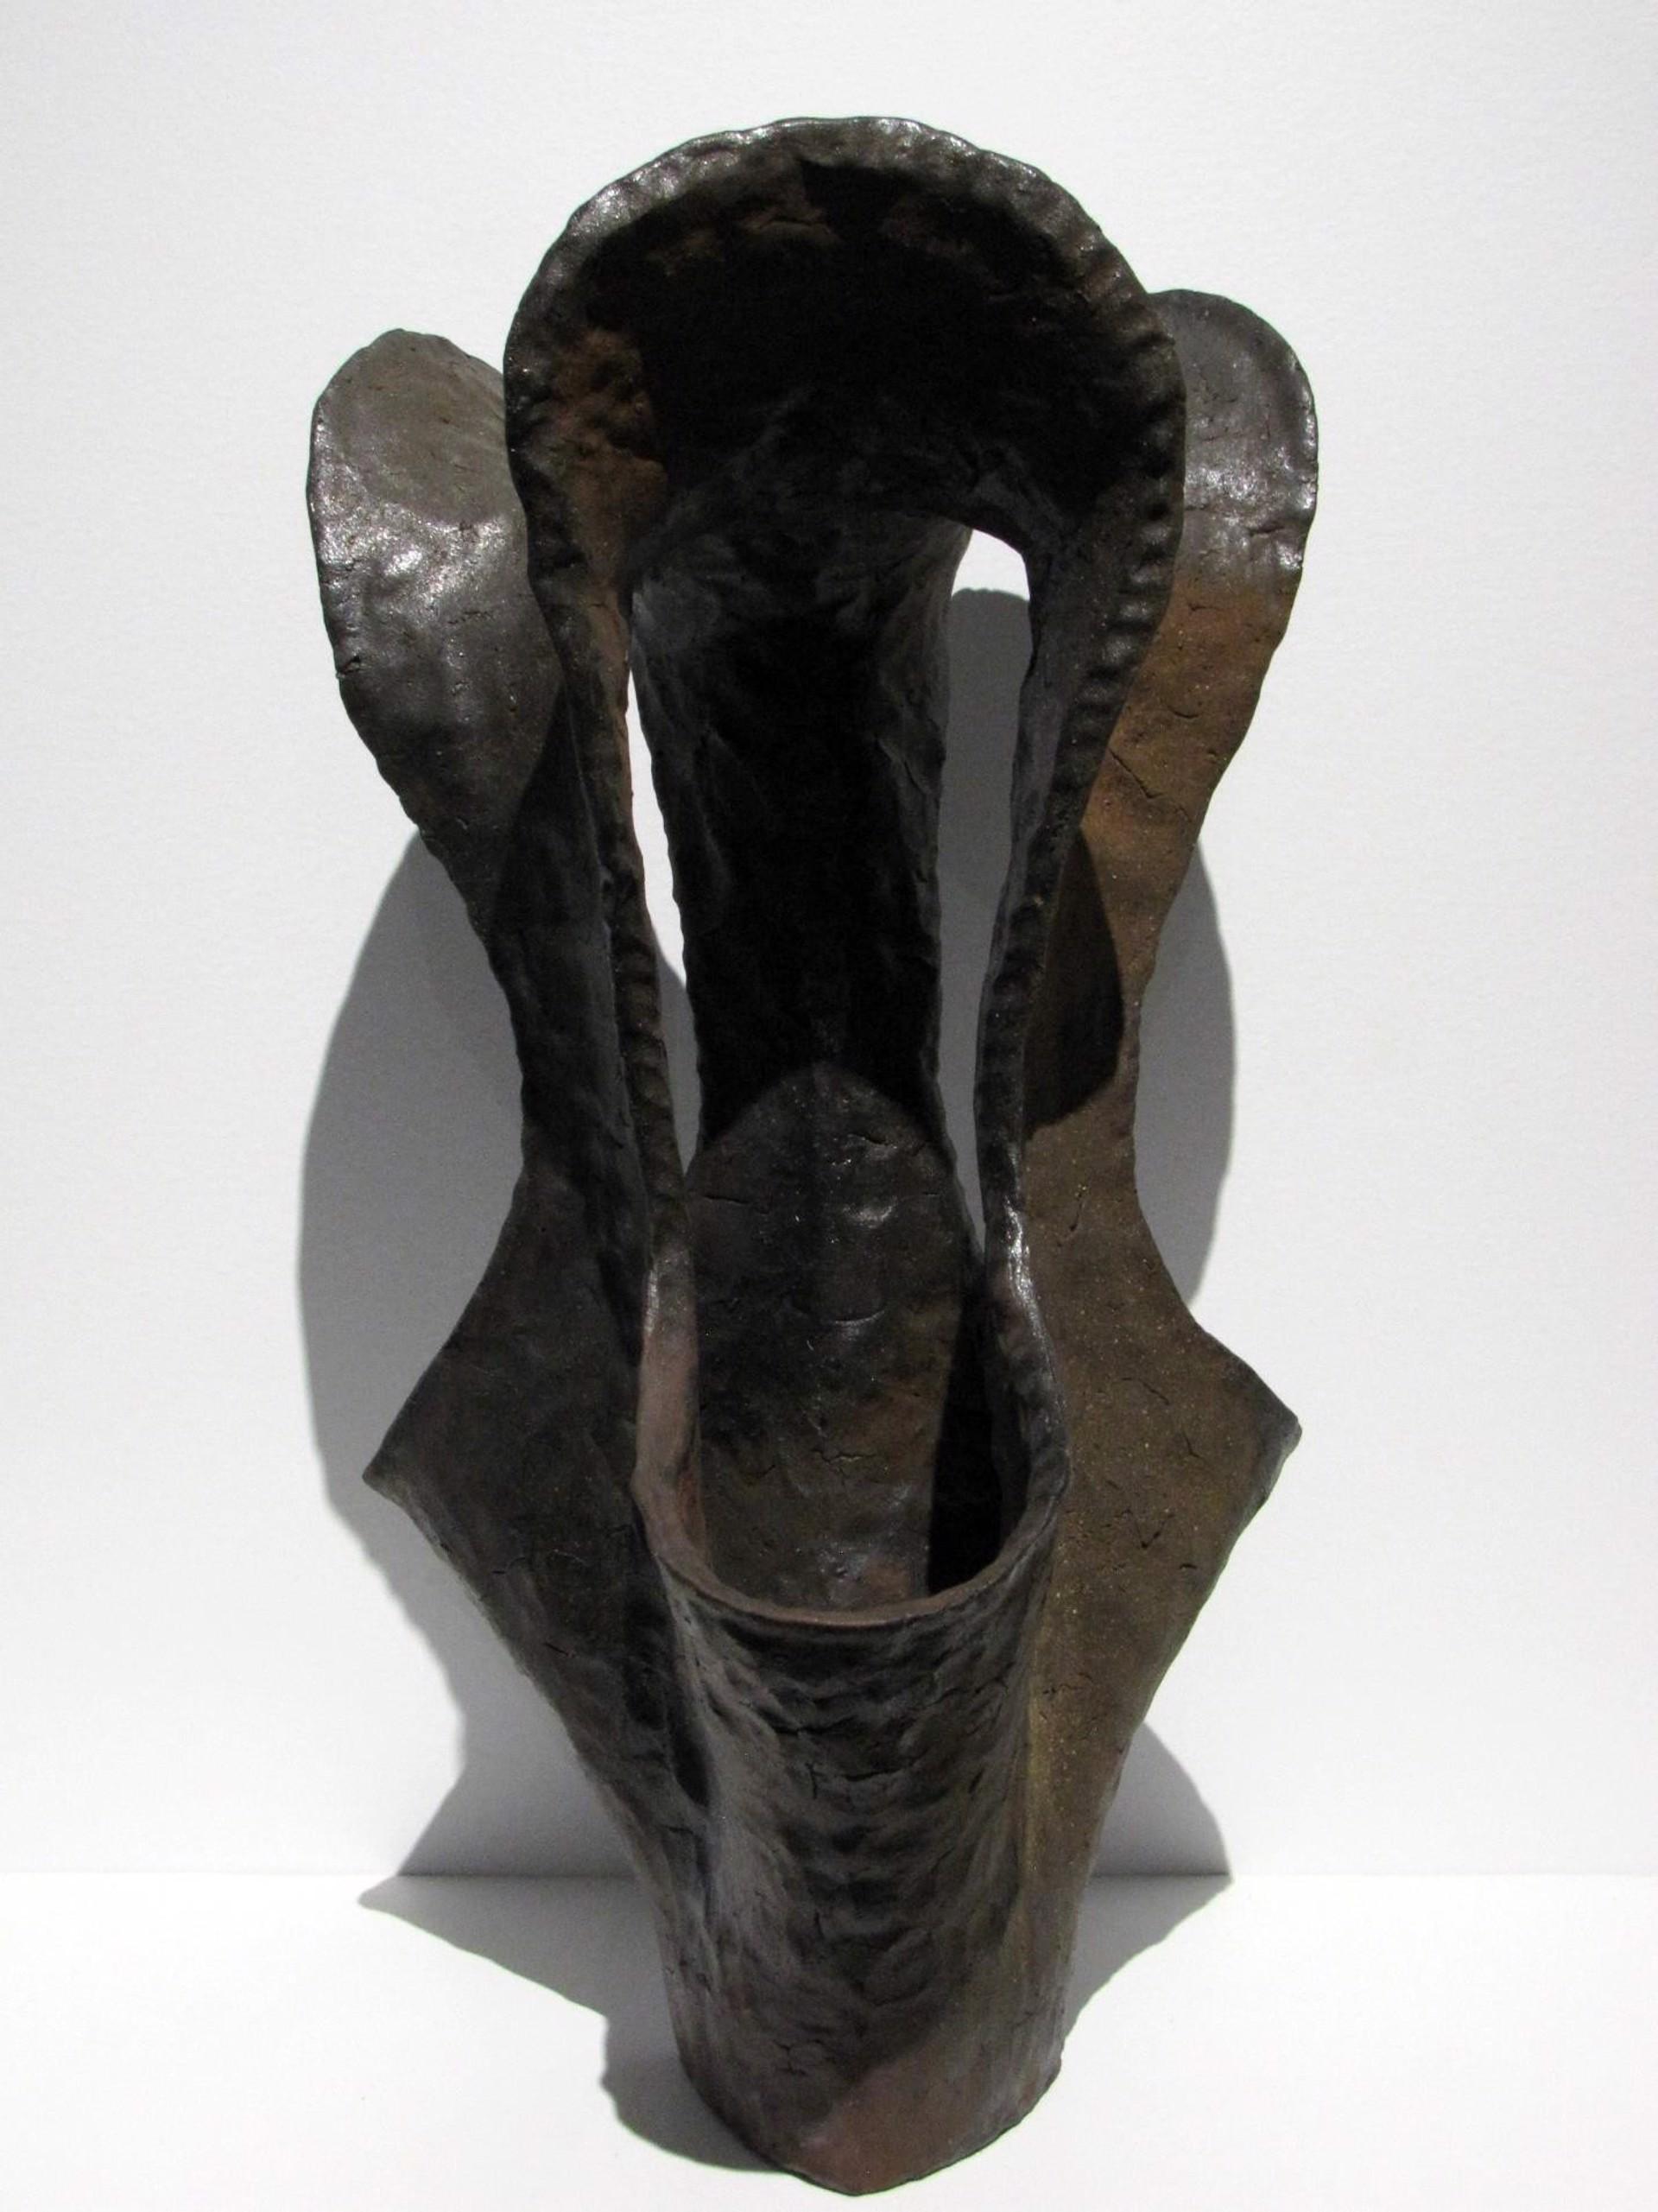 Black and Maroon Basket by Shasta Krueger